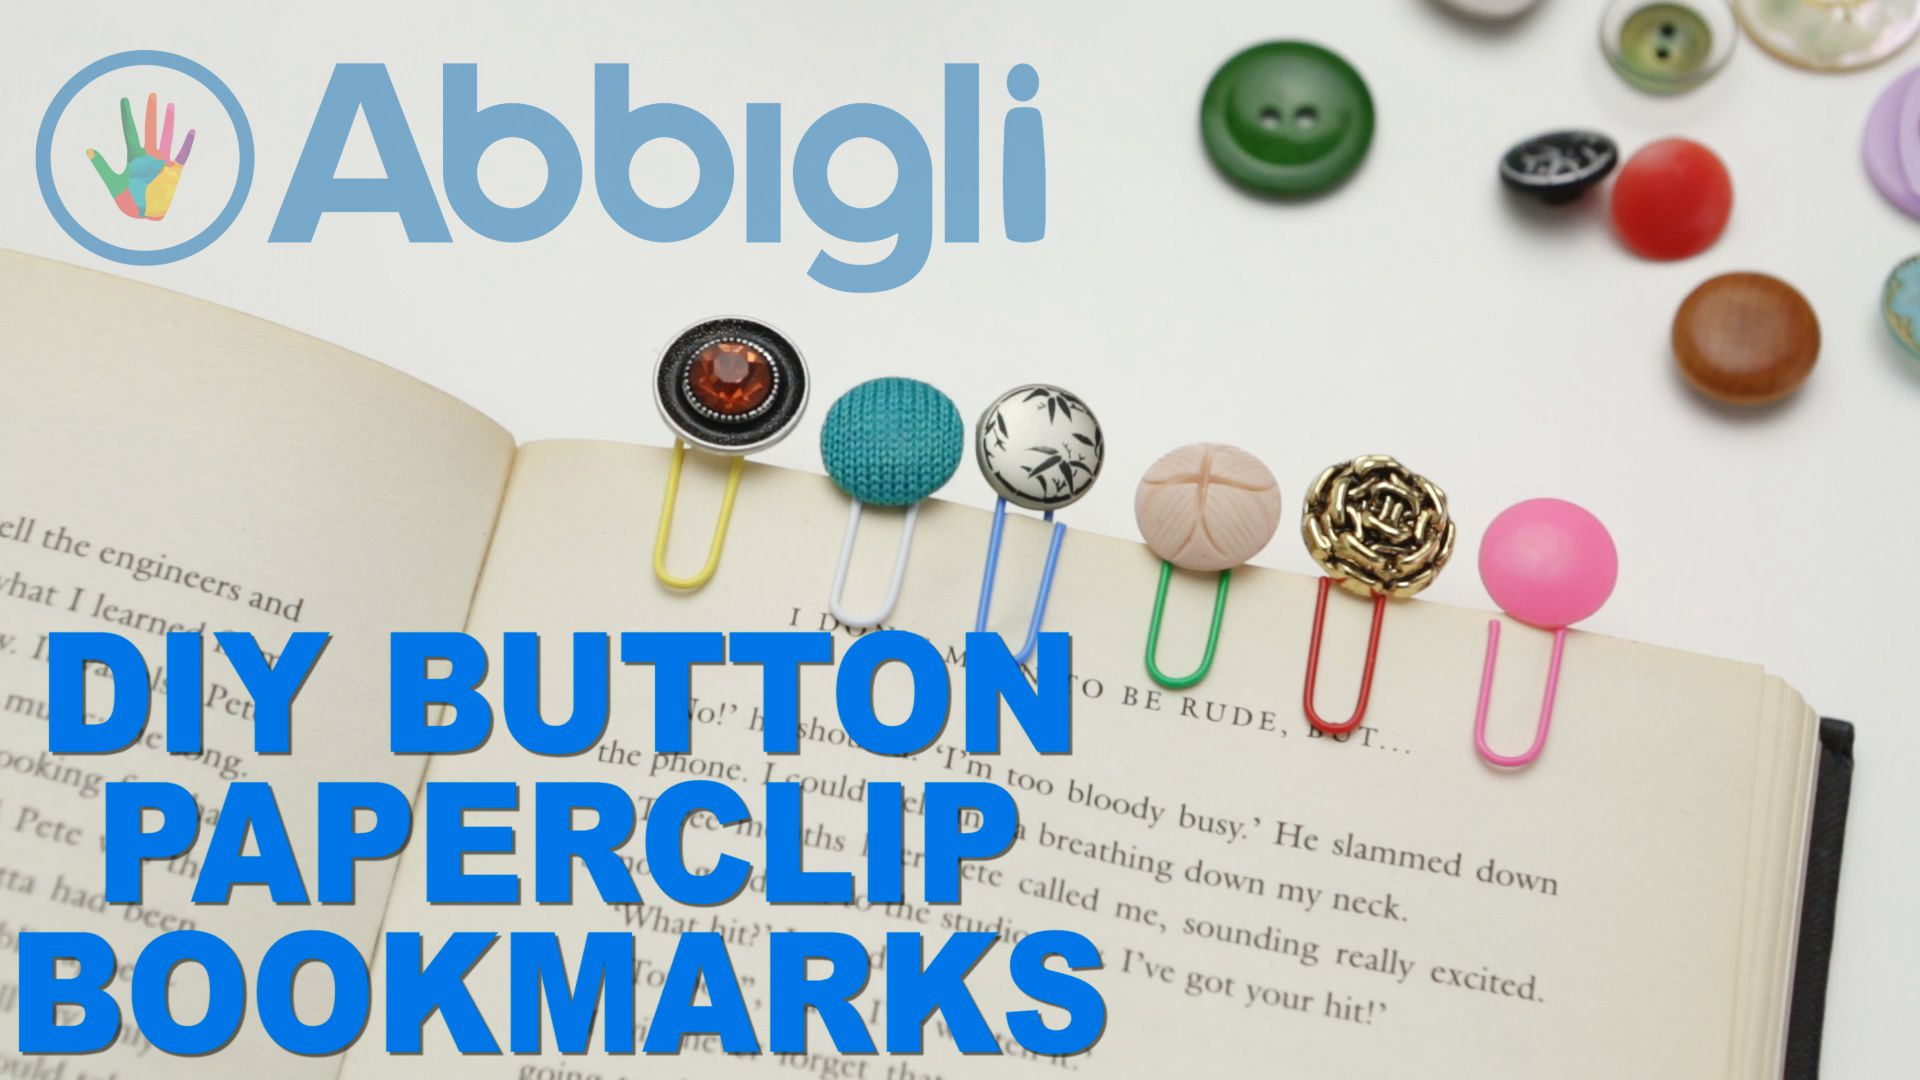 diybookmark diywithkids handmadeforhome abbihome buttons